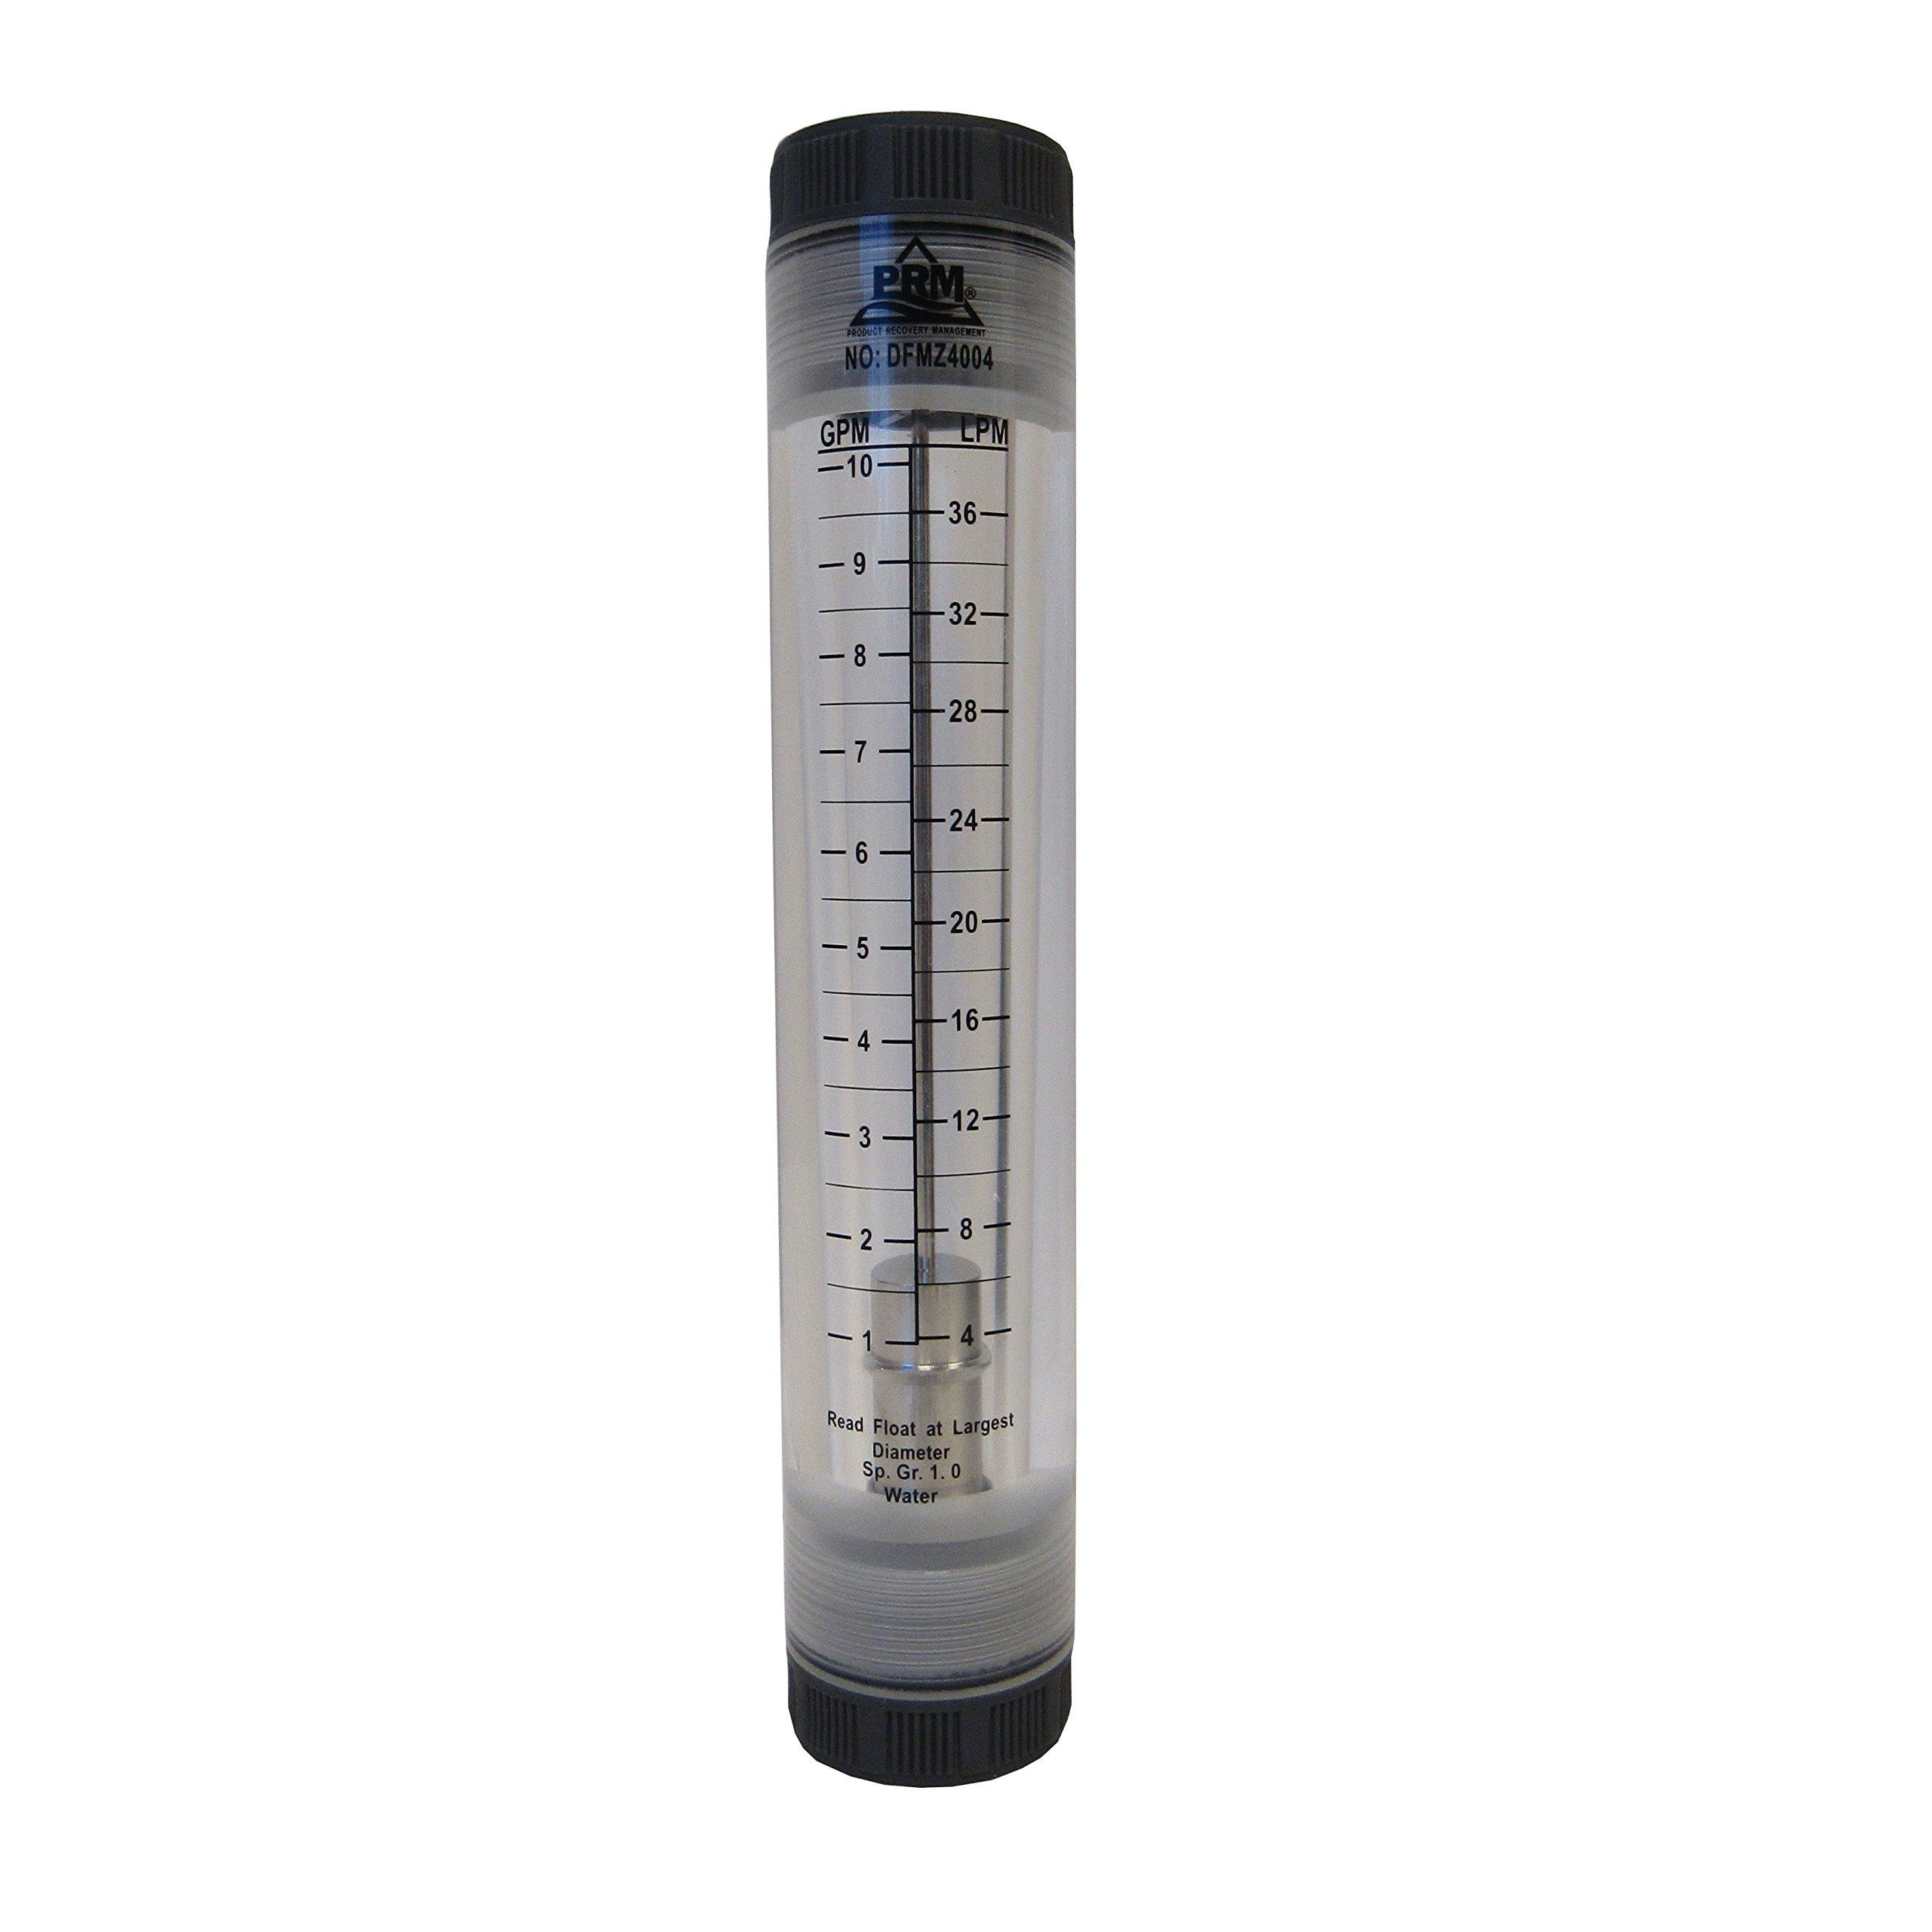 PRM 1-10 GPM ROTAMETER WATER FLOW METER 1 INCH FNPT CONNECTOR